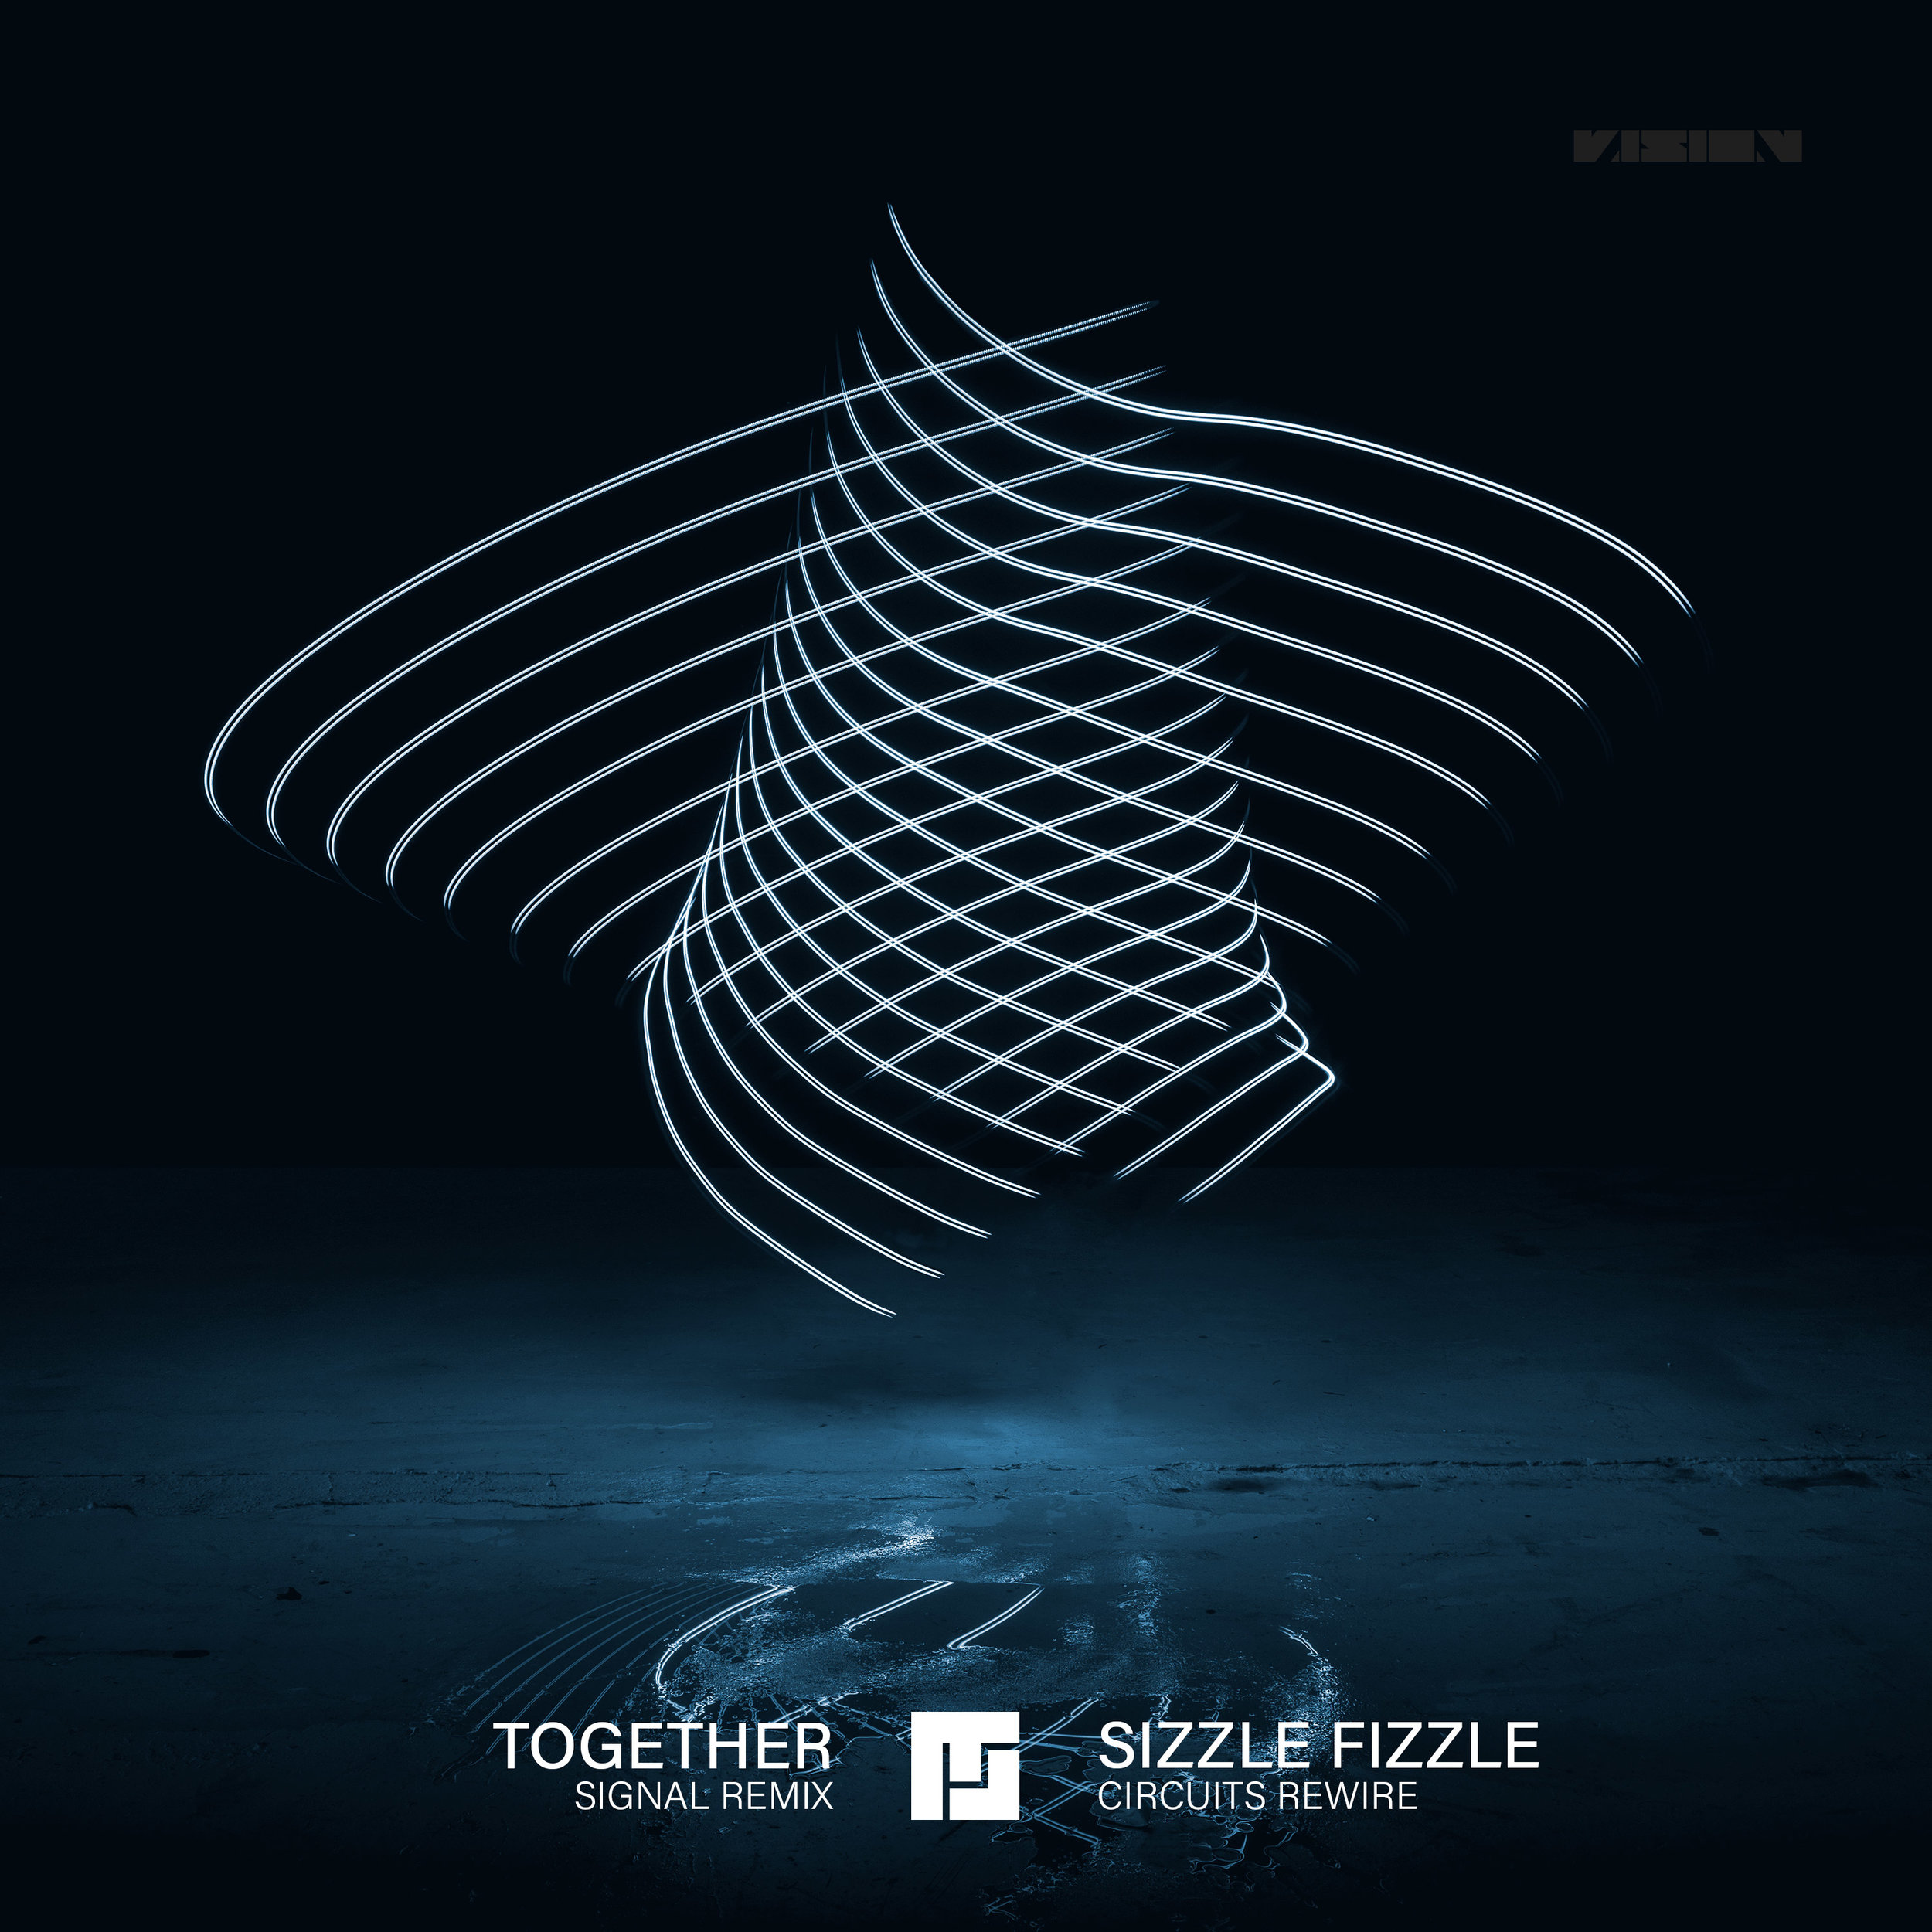 Mefjus - Sizzle Fizzle (Circuits Rewire)